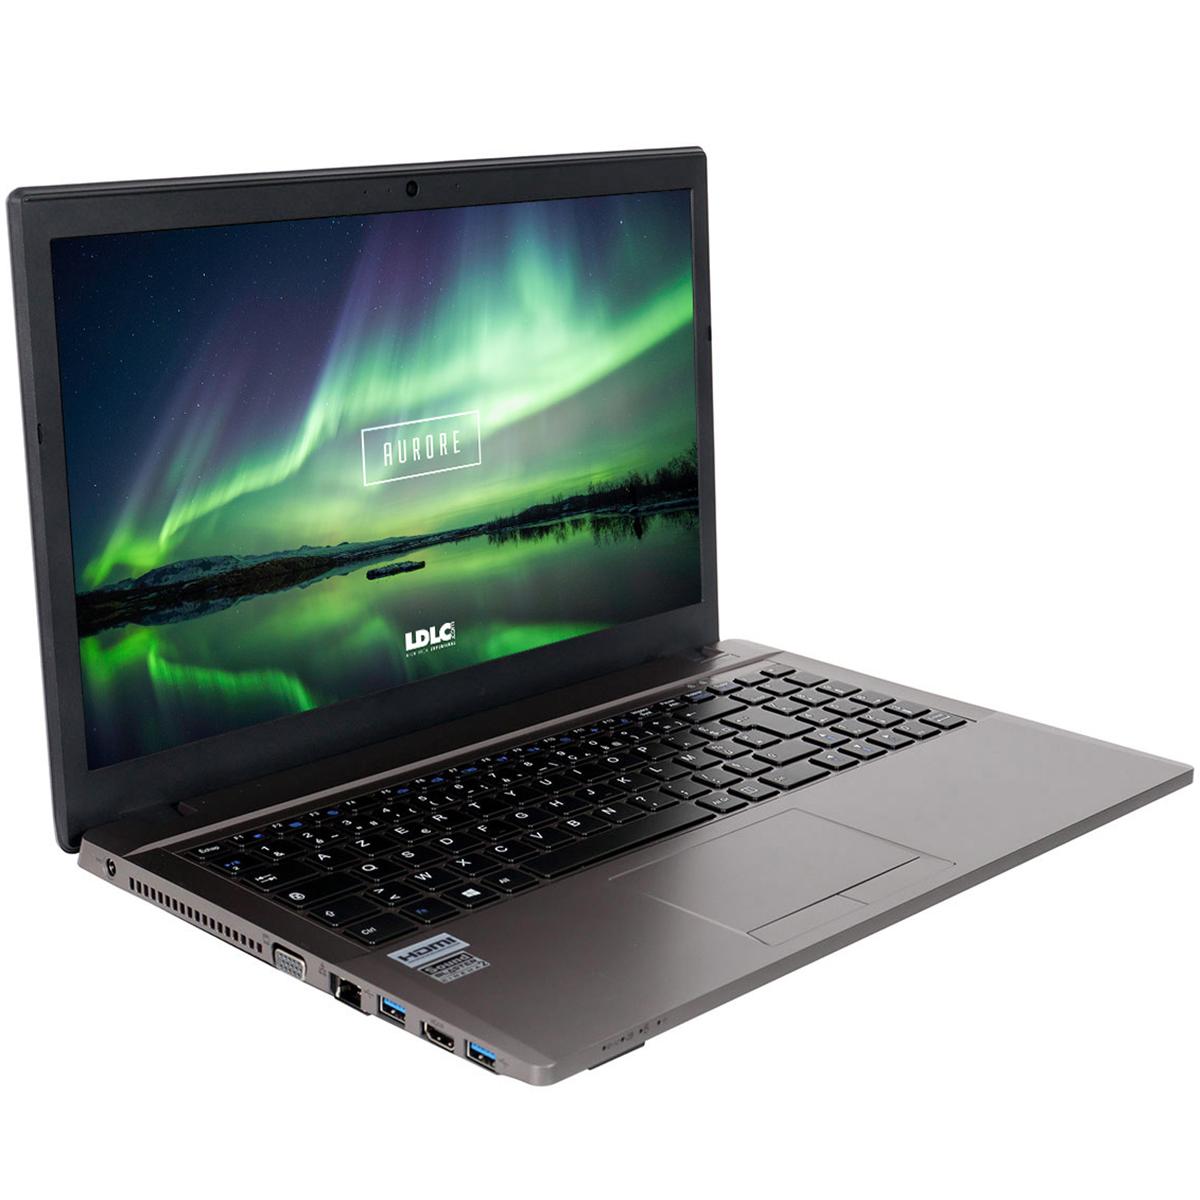 "PC portable LDLC Aurore Ti5P-8-S5 Intel Core i5-6300HQ 8 Go SSD 480 Go 15.6"" LED Full HD Graveur DVD Wi-Fi N/Bluetooth Webcam (sans OS)"